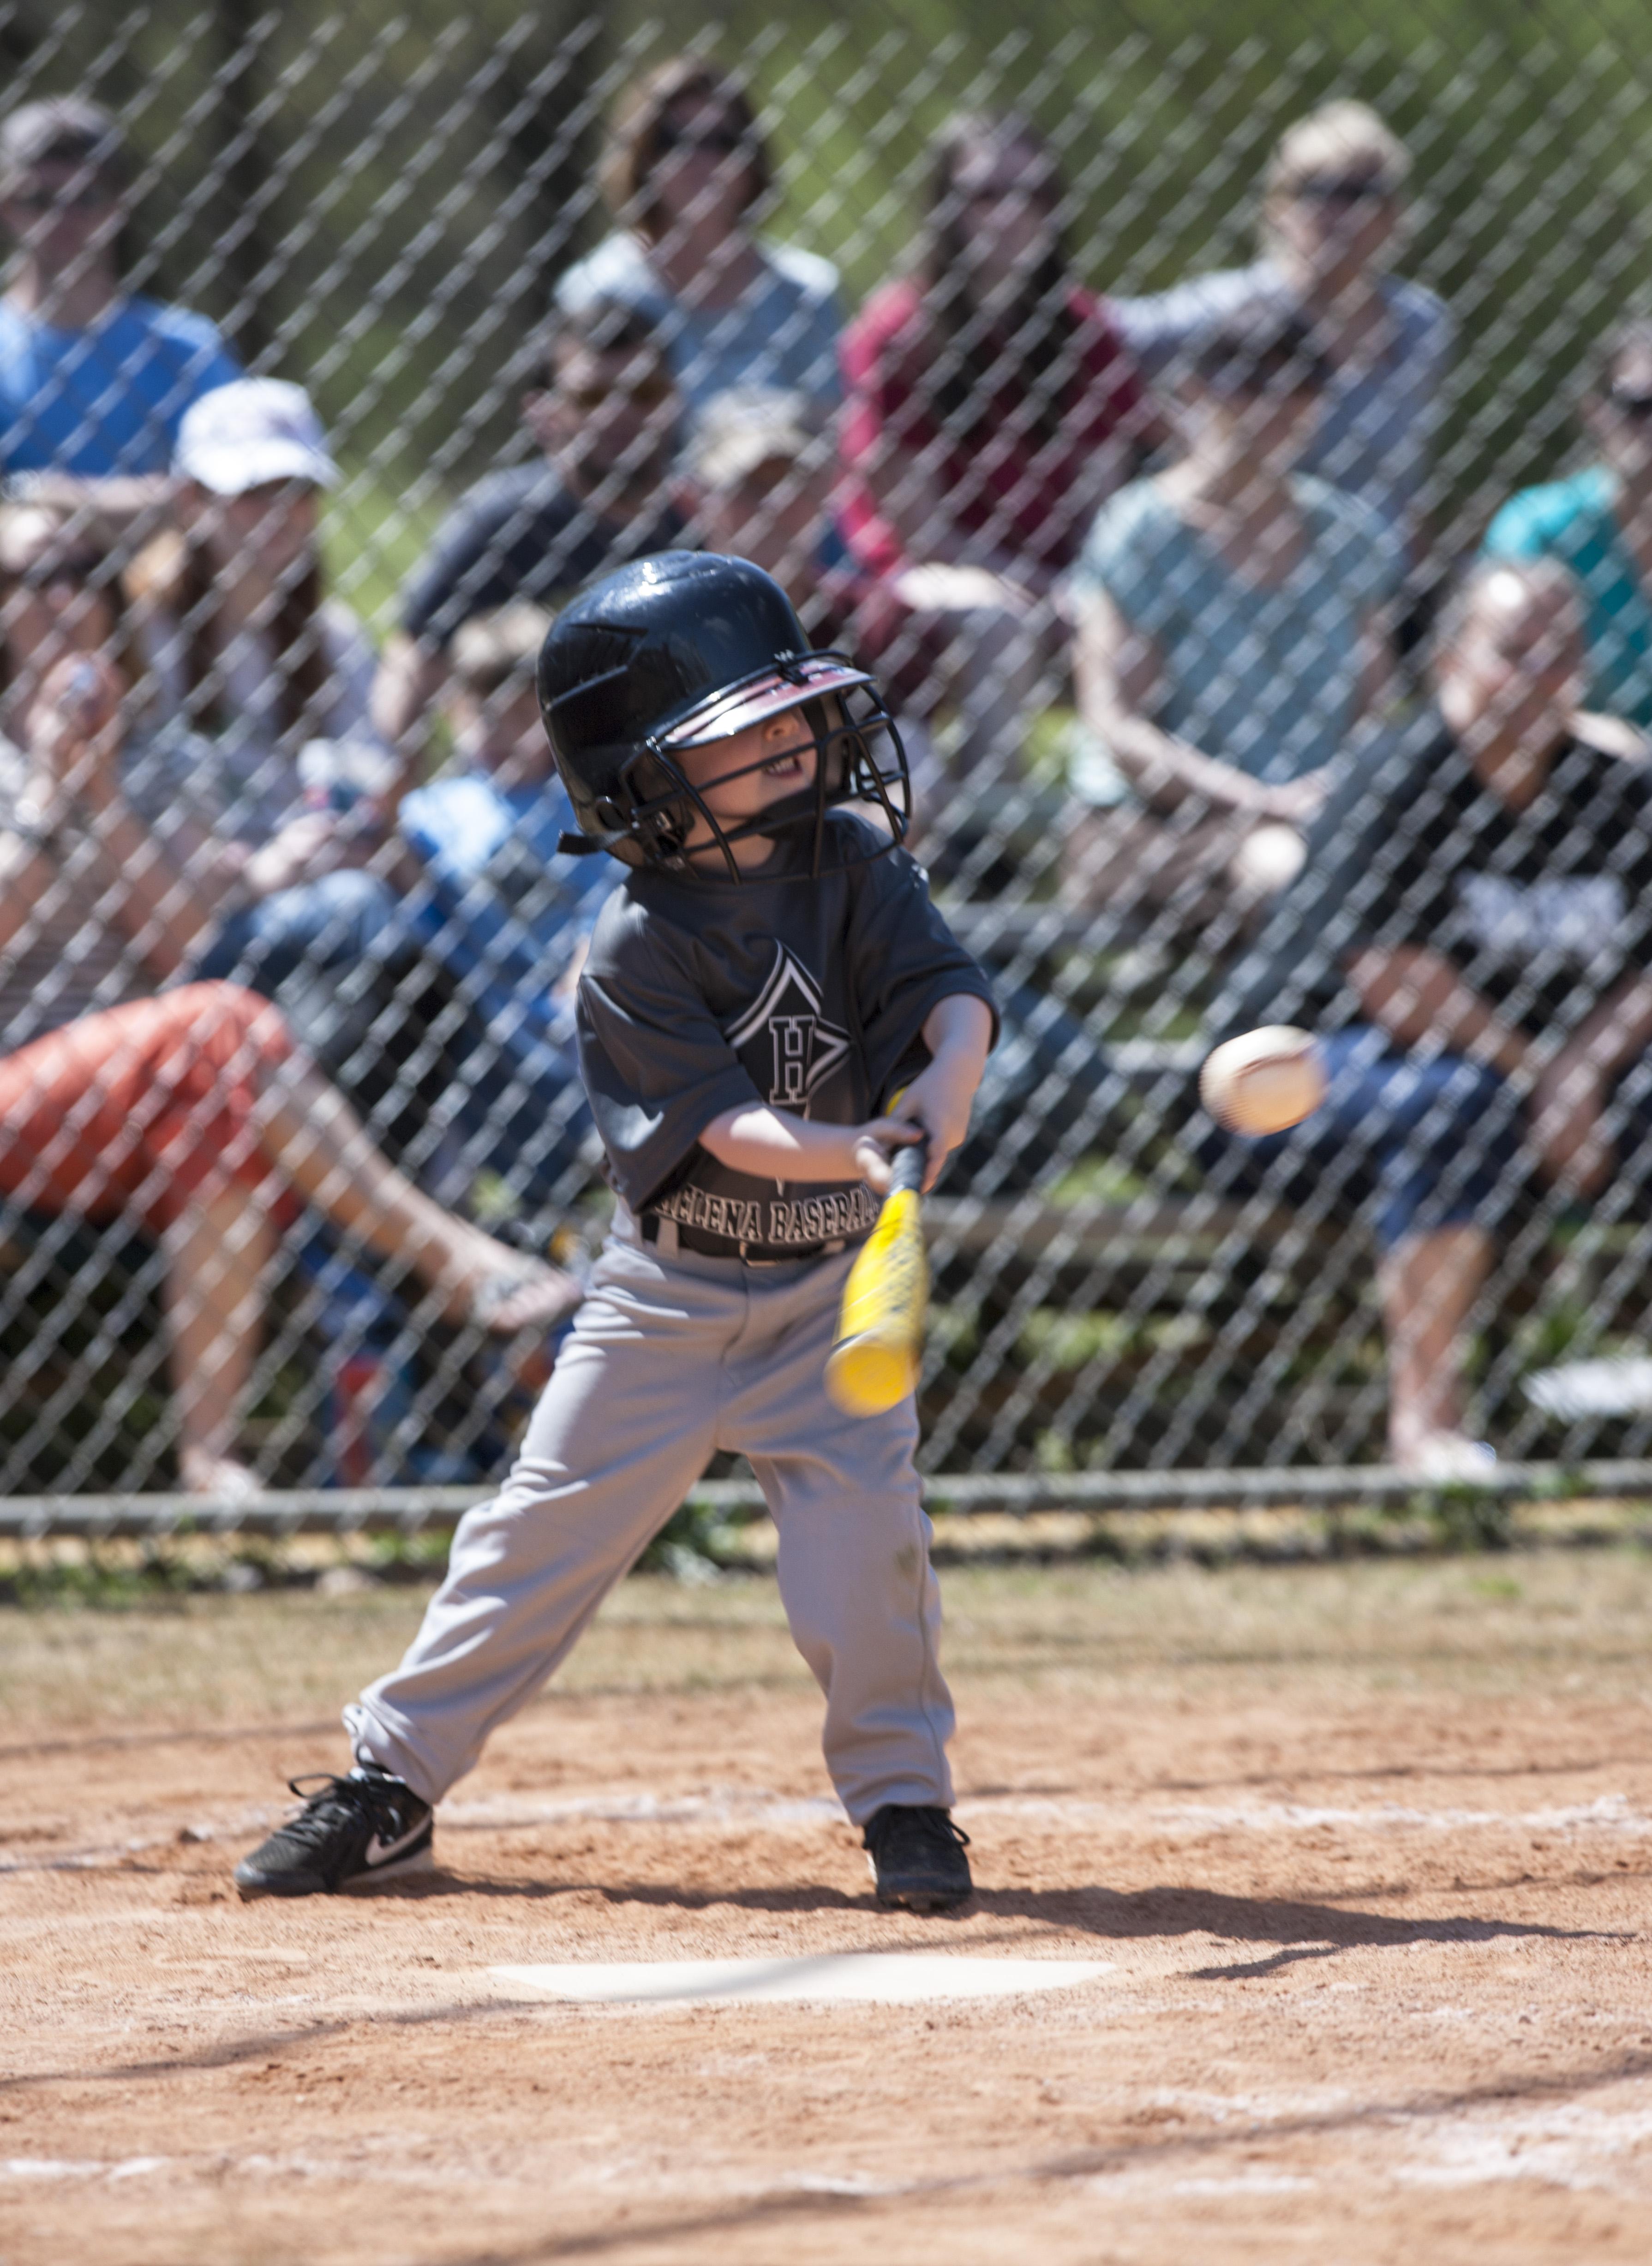 Little Kid Playing Baseball